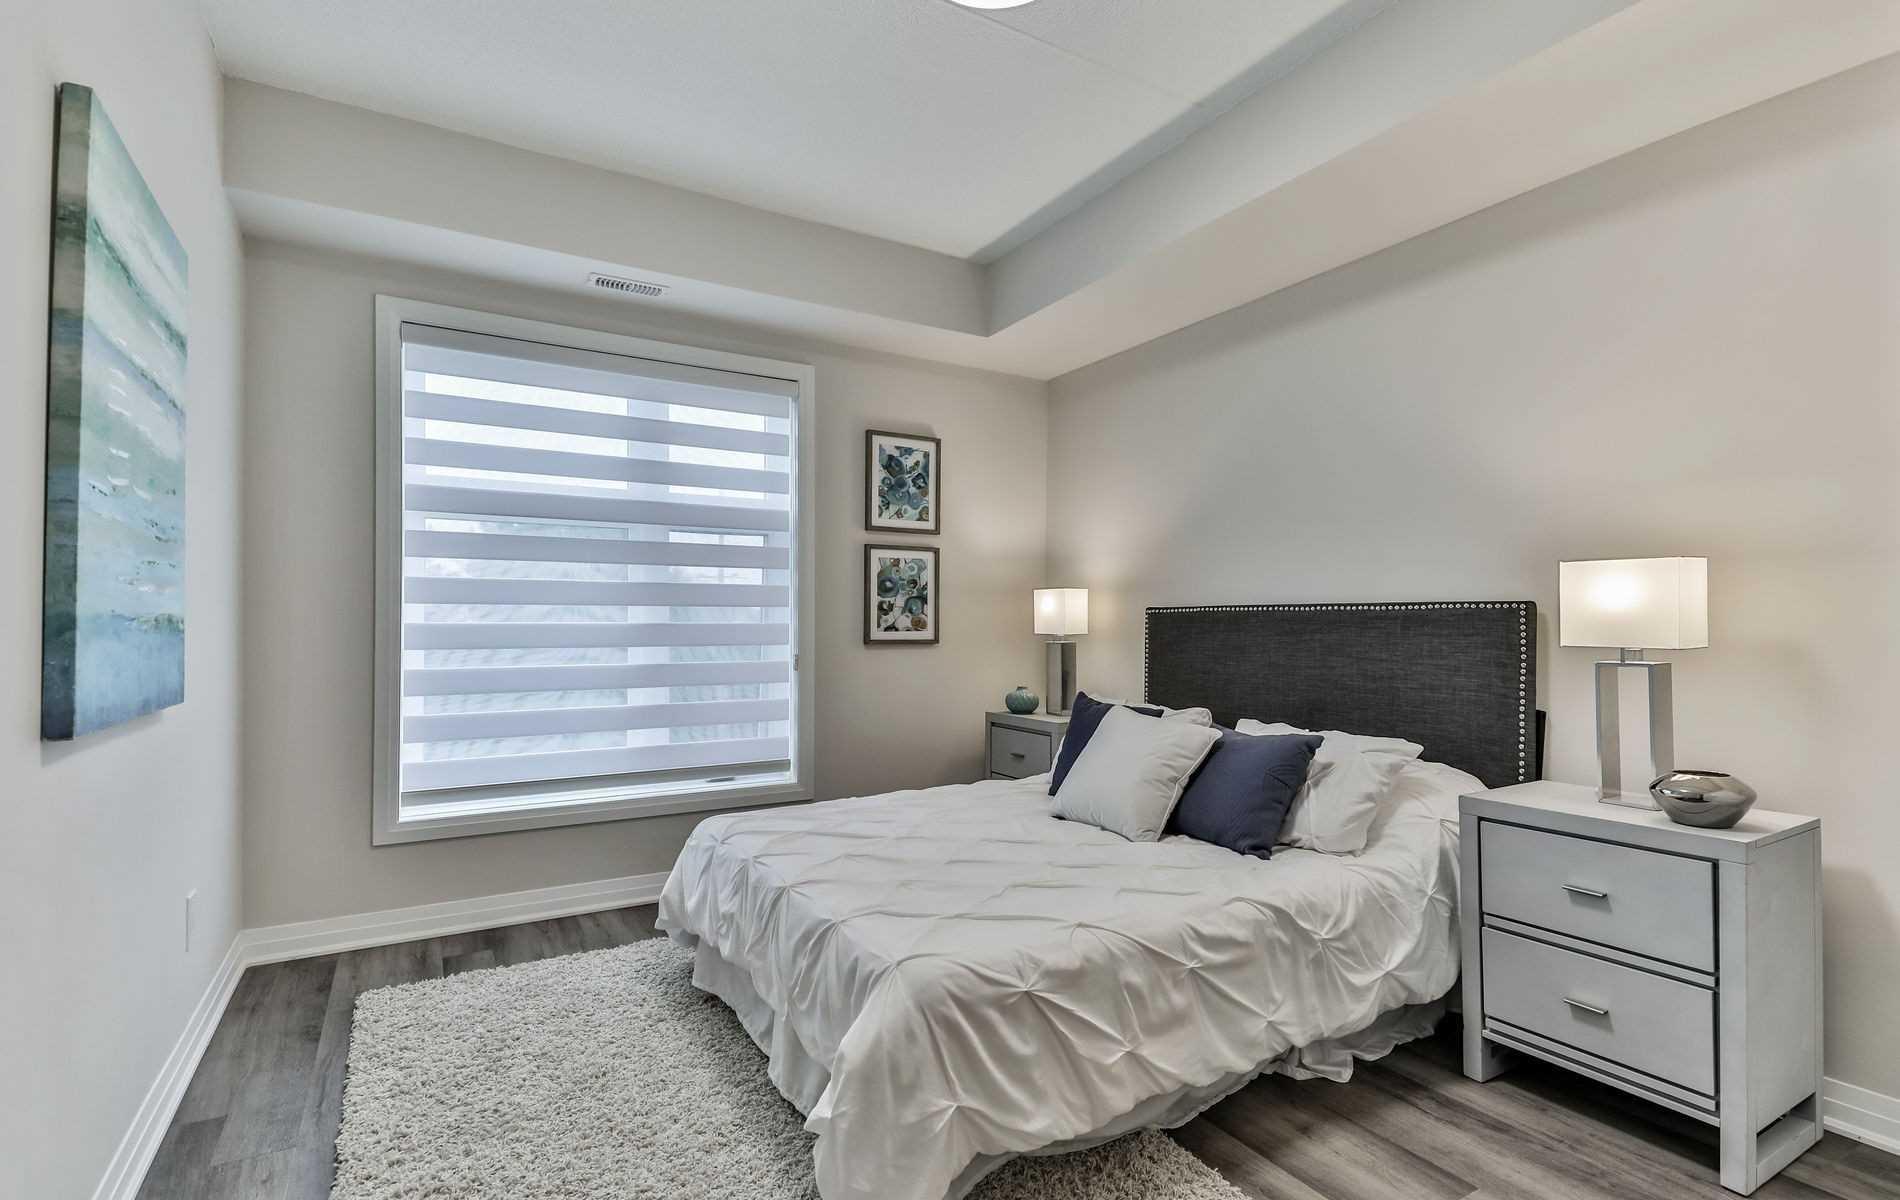 316 - 610 Farmstead Dr - Willmont Condo Apt for sale, 2 Bedrooms (W5399854) - #14